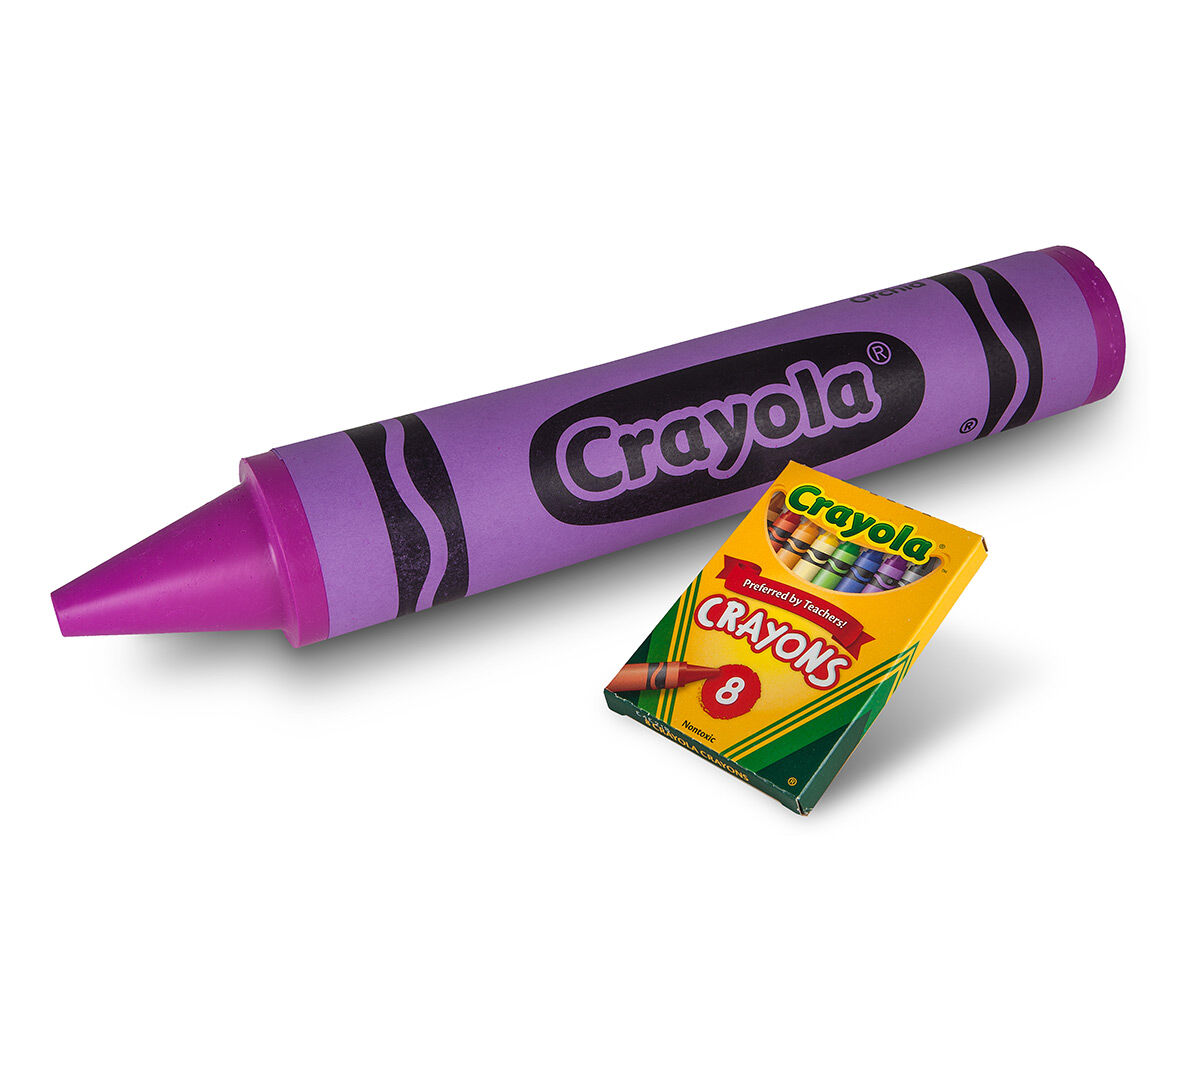 Giant Crayola Crayon - Orchid